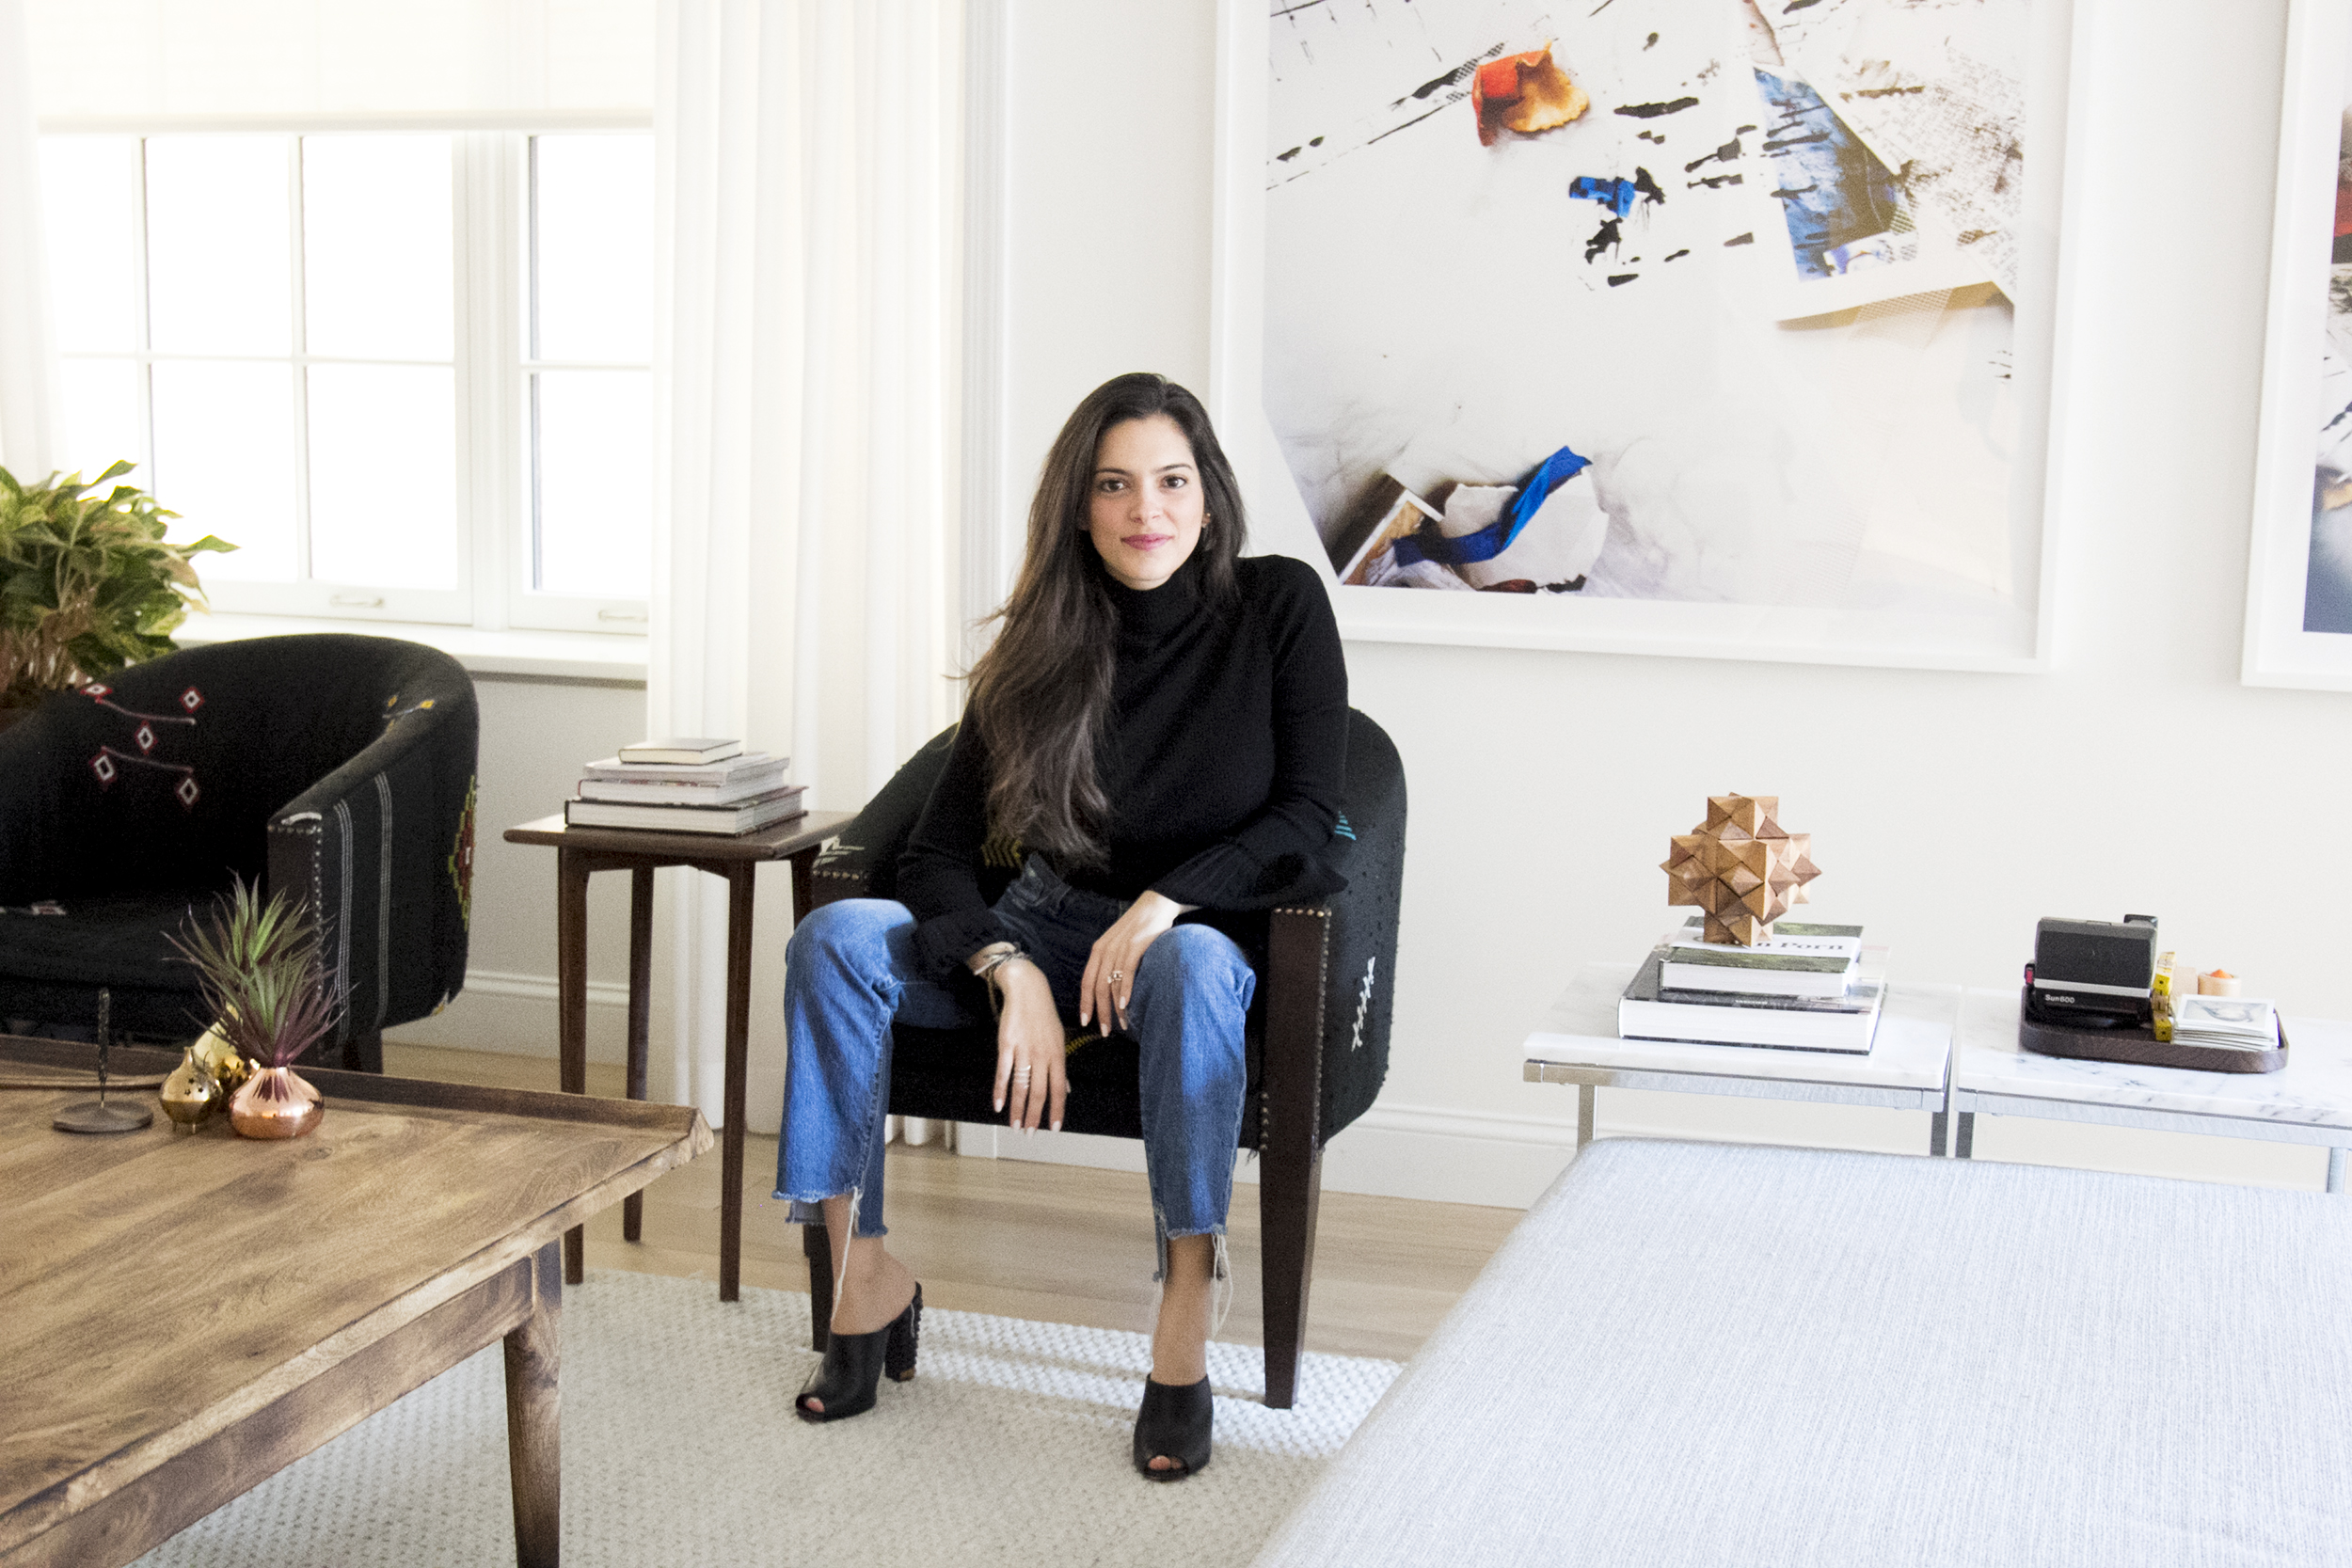 Bari Studio founder, Alexandra Bonetti Perez